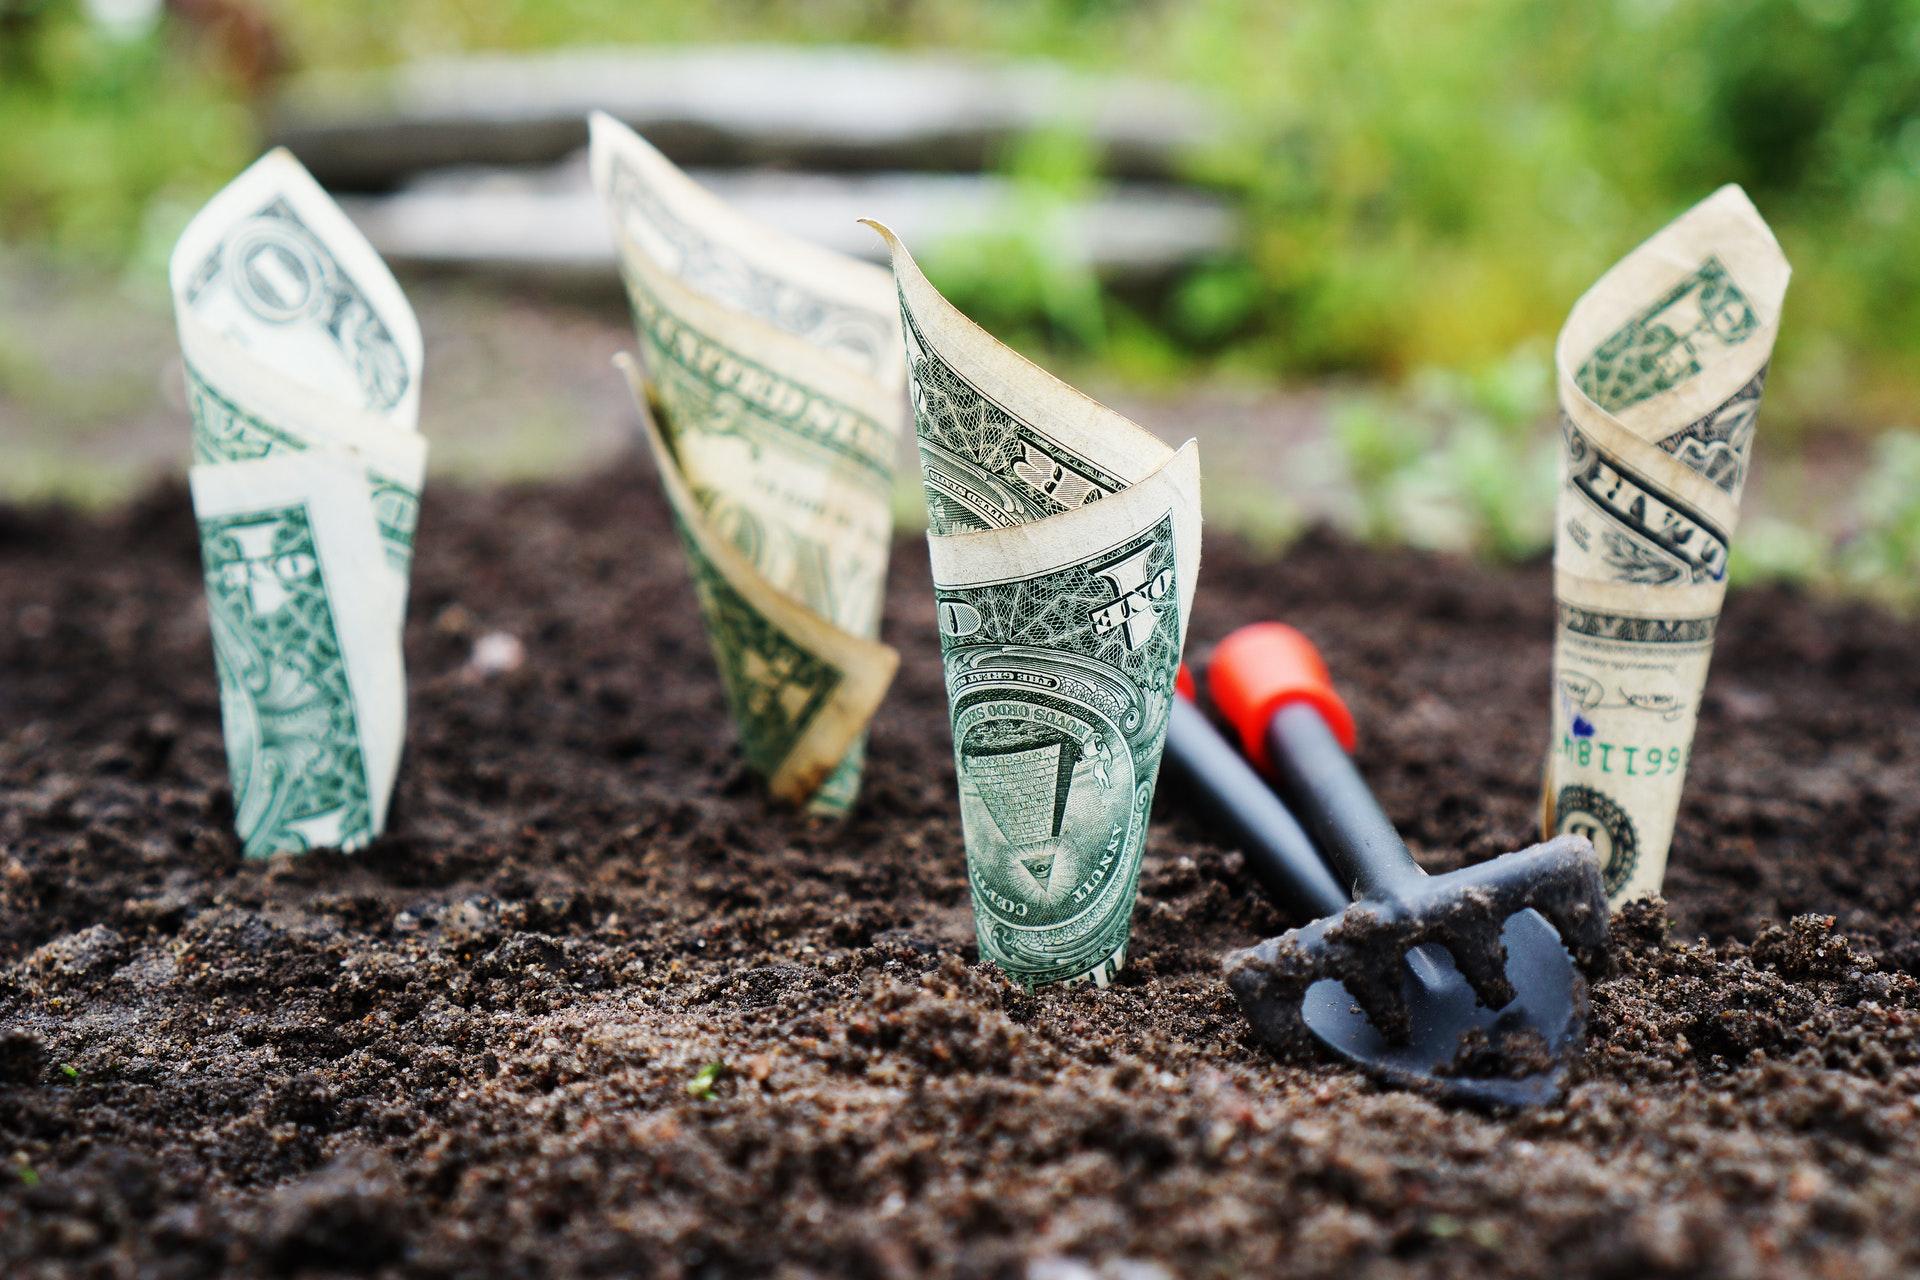 ¿Cuánto vale mi startup?